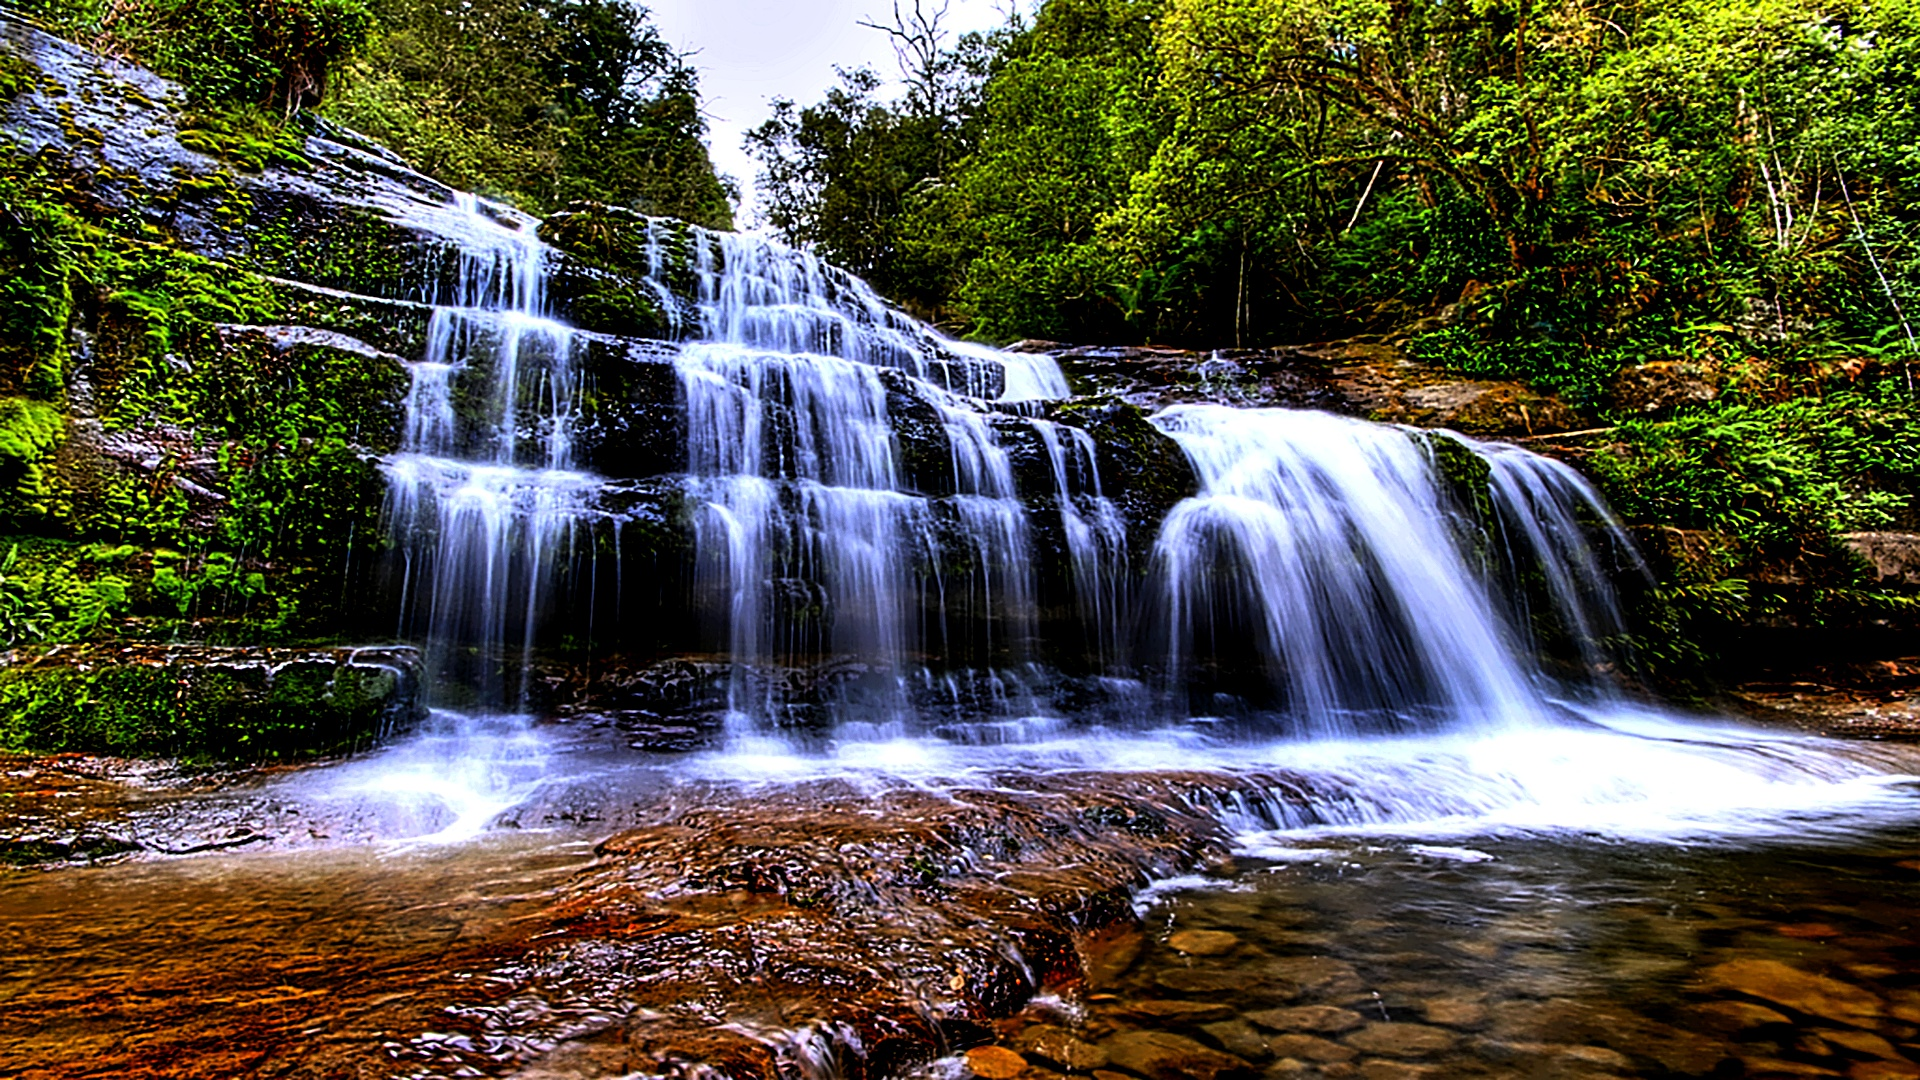 Live Waterfalls Wallpapers with Sound - WallpaperSafari